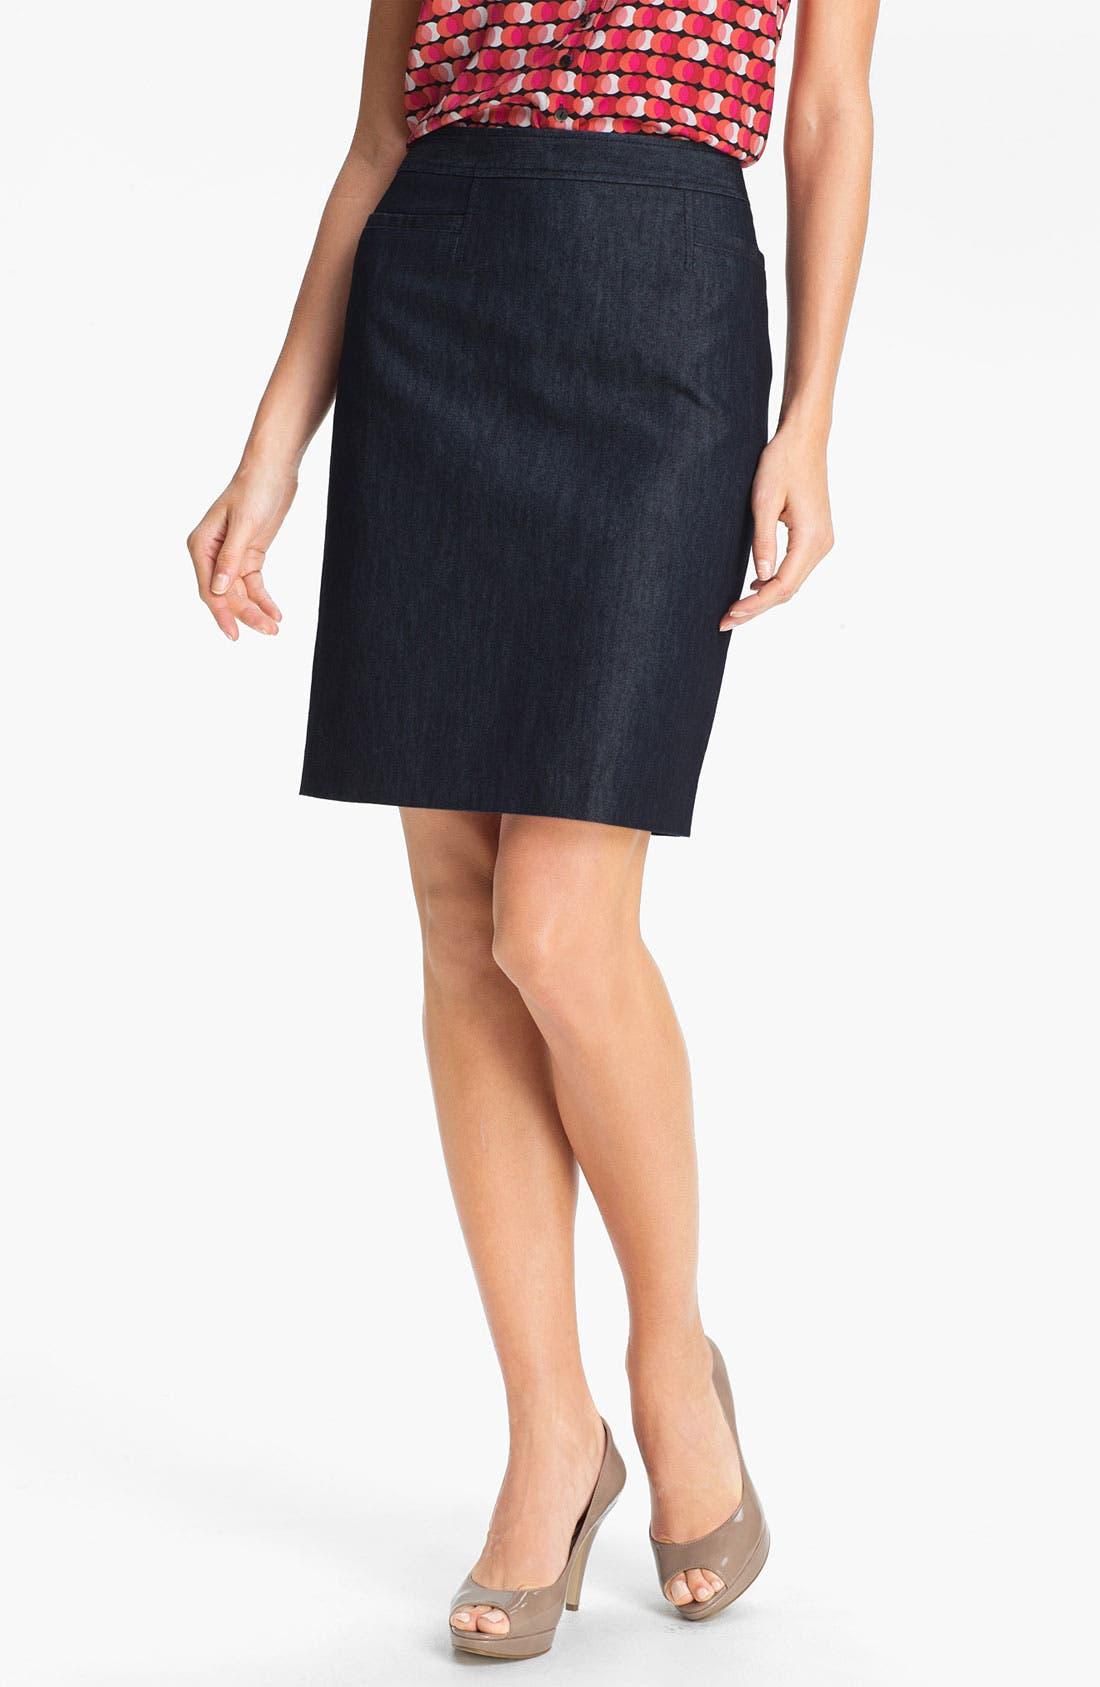 Alternate Image 1 Selected - Halogen® Stretch Woven Skirt (Regular & Petite)